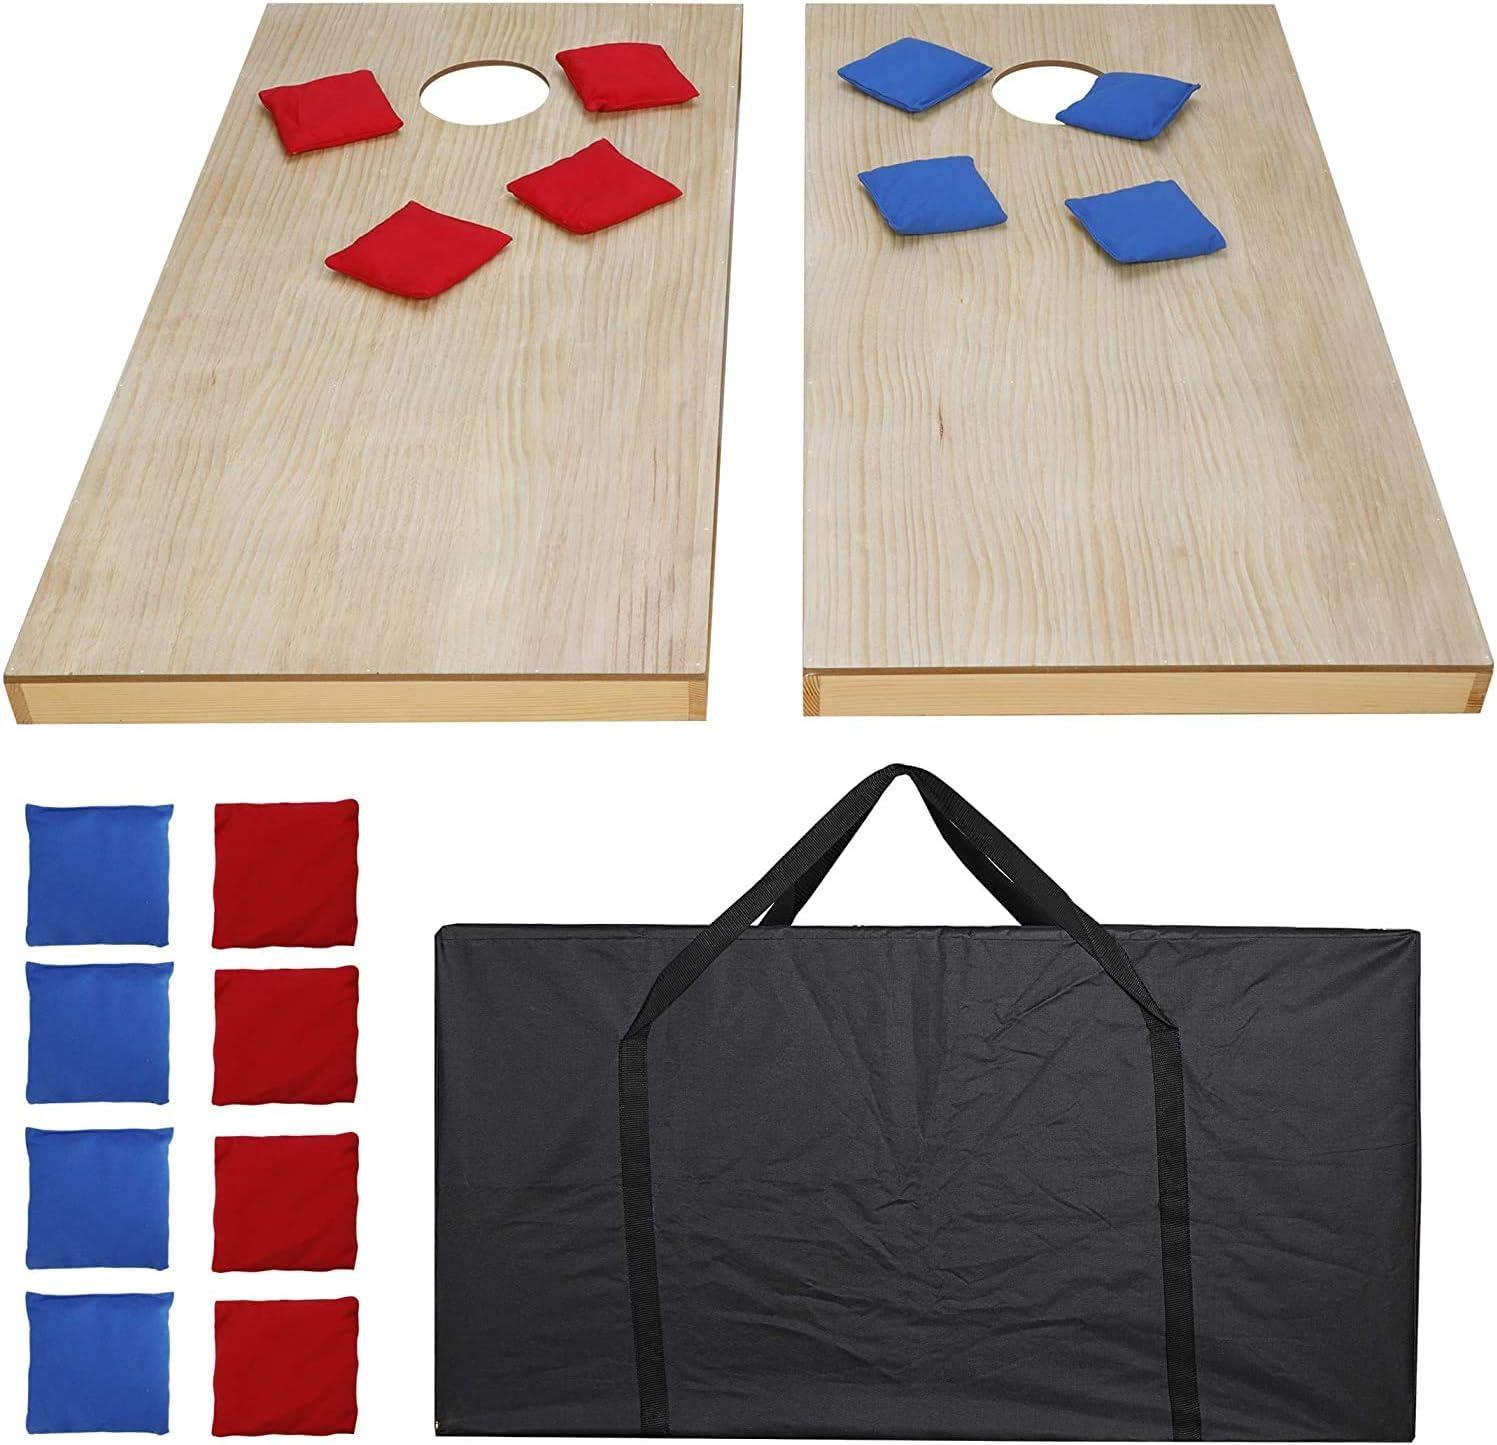 Smartxchoices Portable low-pricing Wood Cornhole Set Ultra-Cheap Deals 4'x Bag Bean 2' Ga Toss